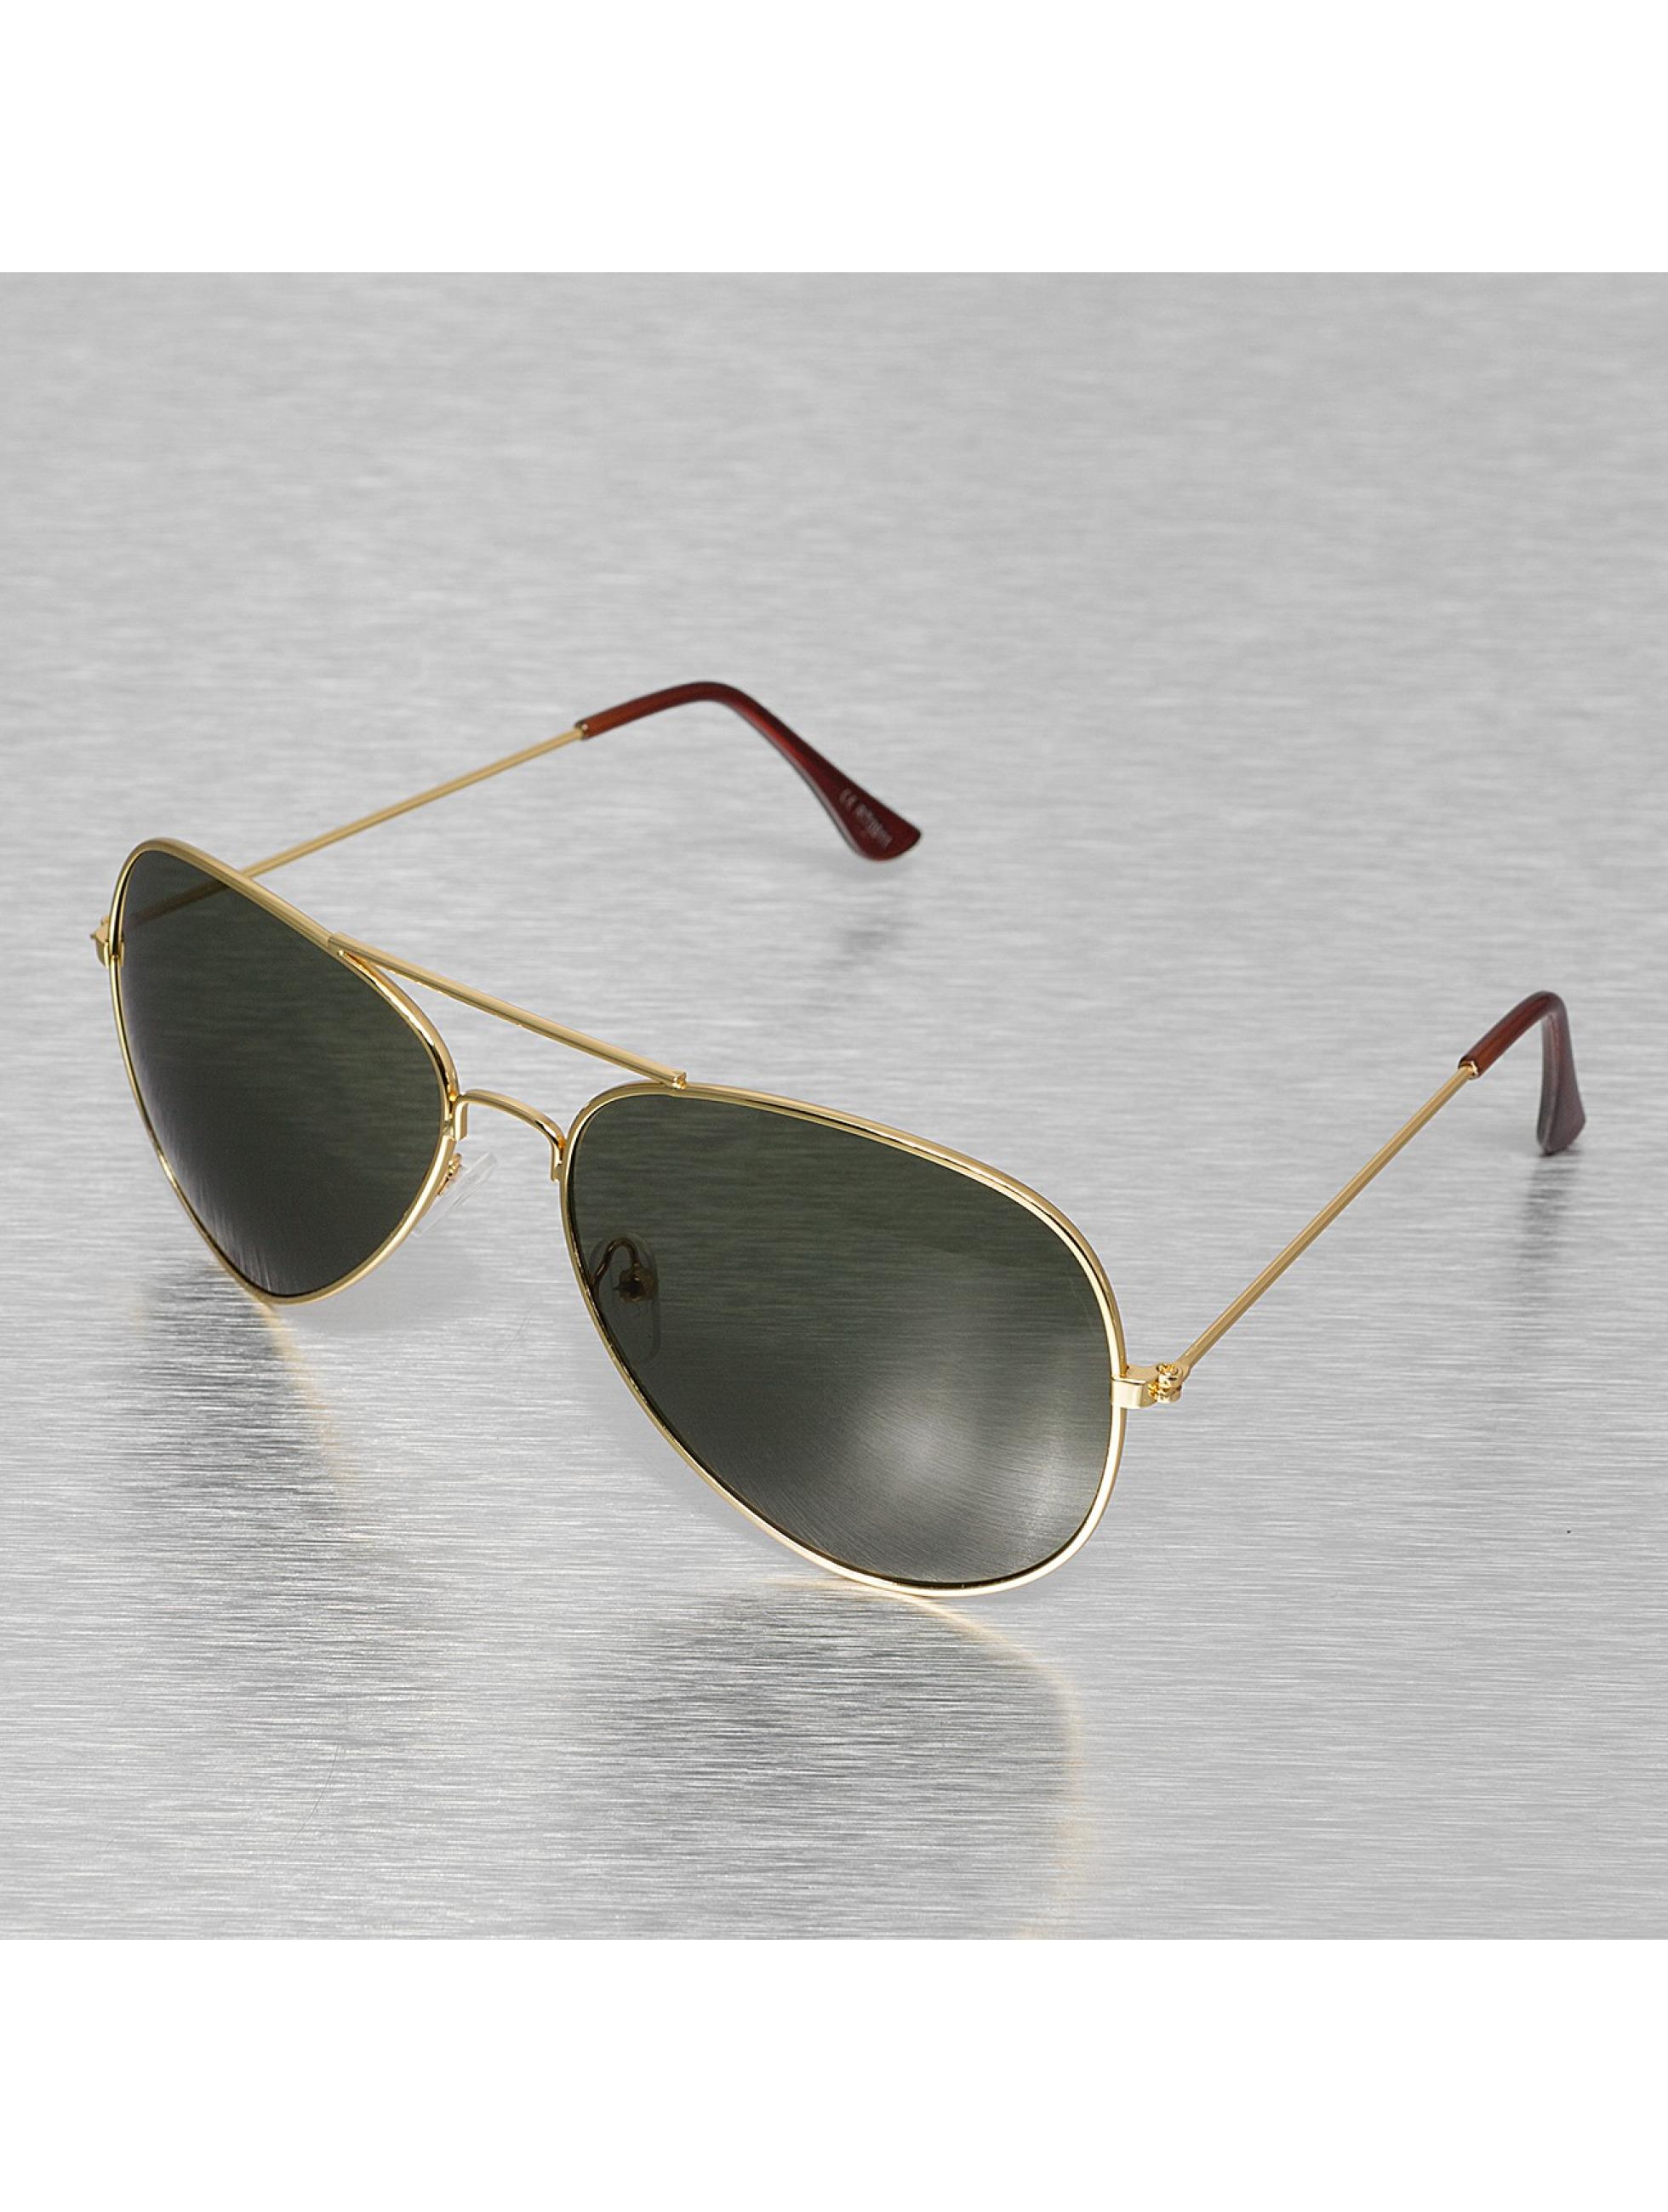 Miami Vision Sonnenbrille Vision goldfarben